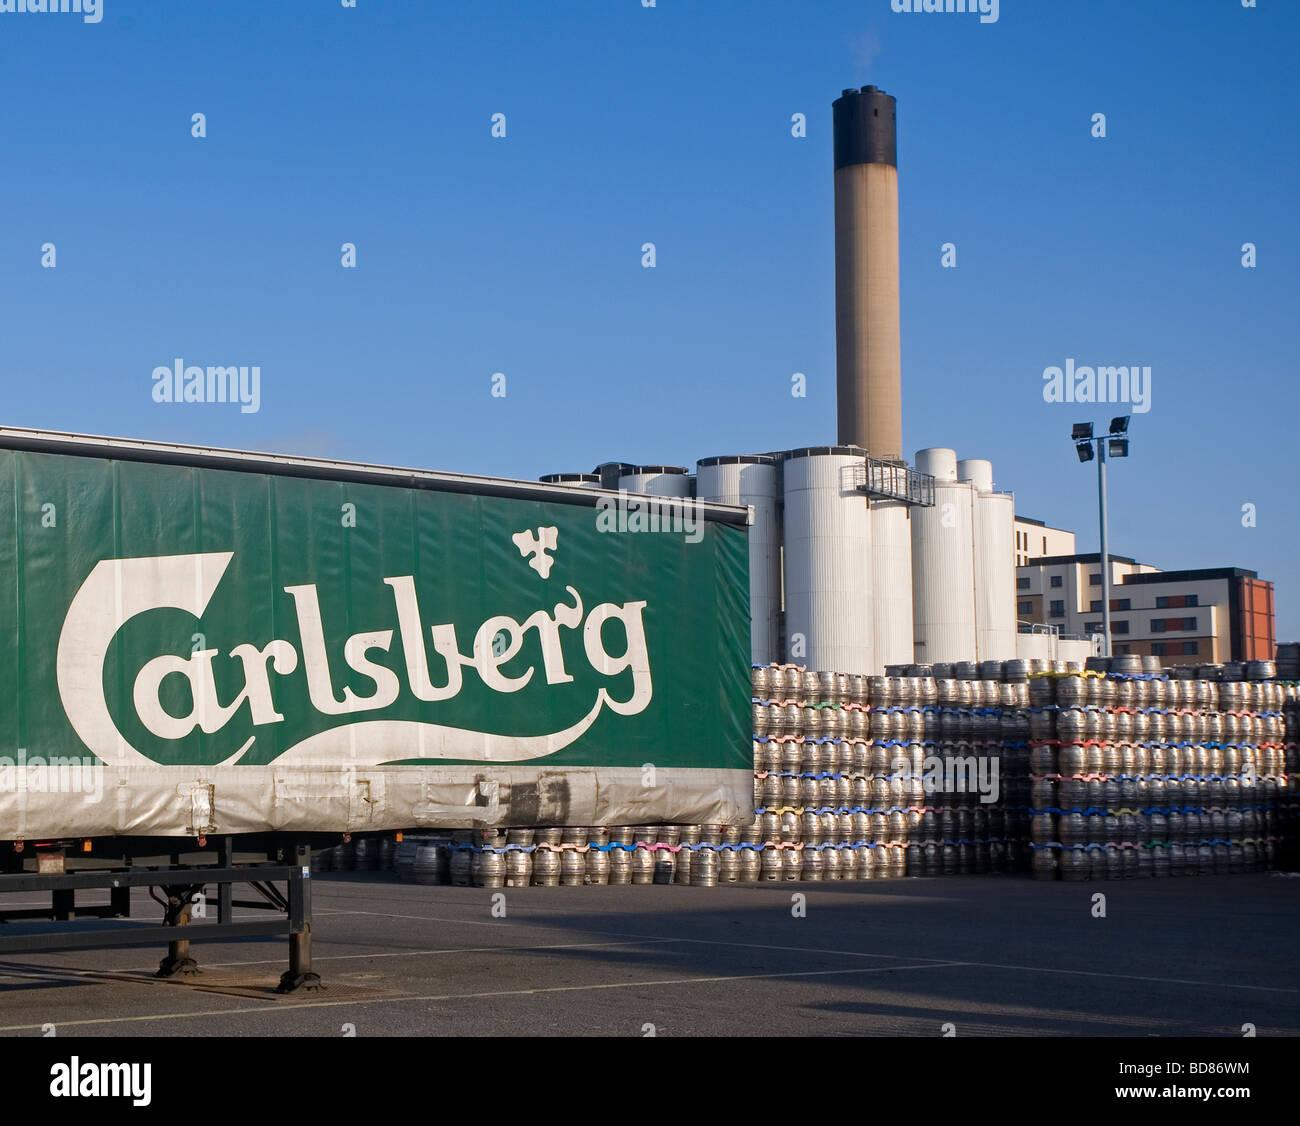 Carlsberg Tetley brewery in Leeds England - Stock Image